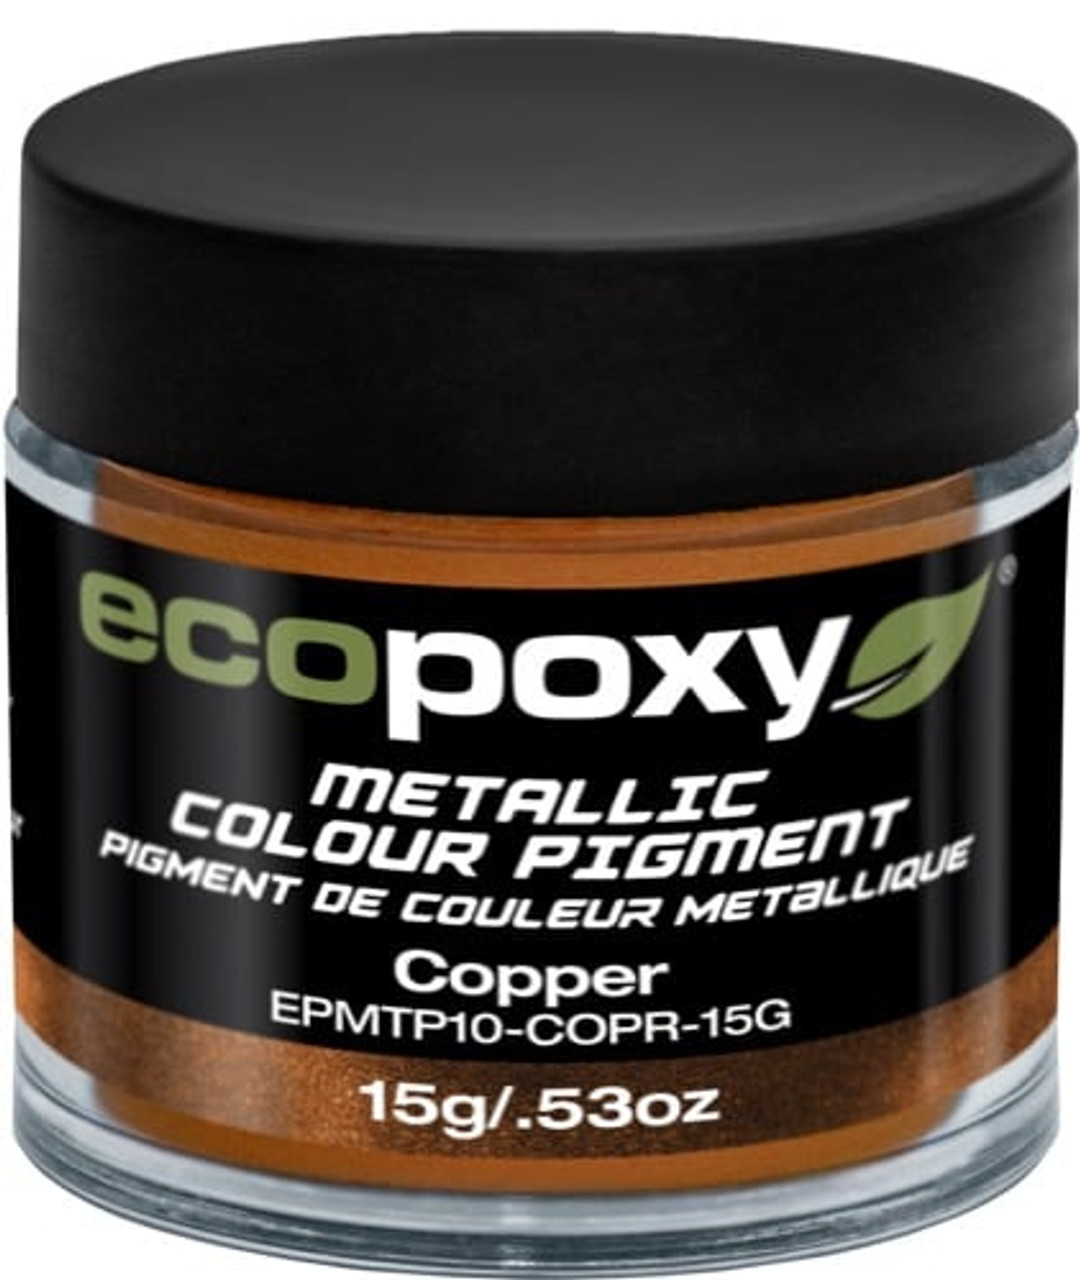 EcoPoxy - 15g Metallic ColorPigment - Copper (628199908282)